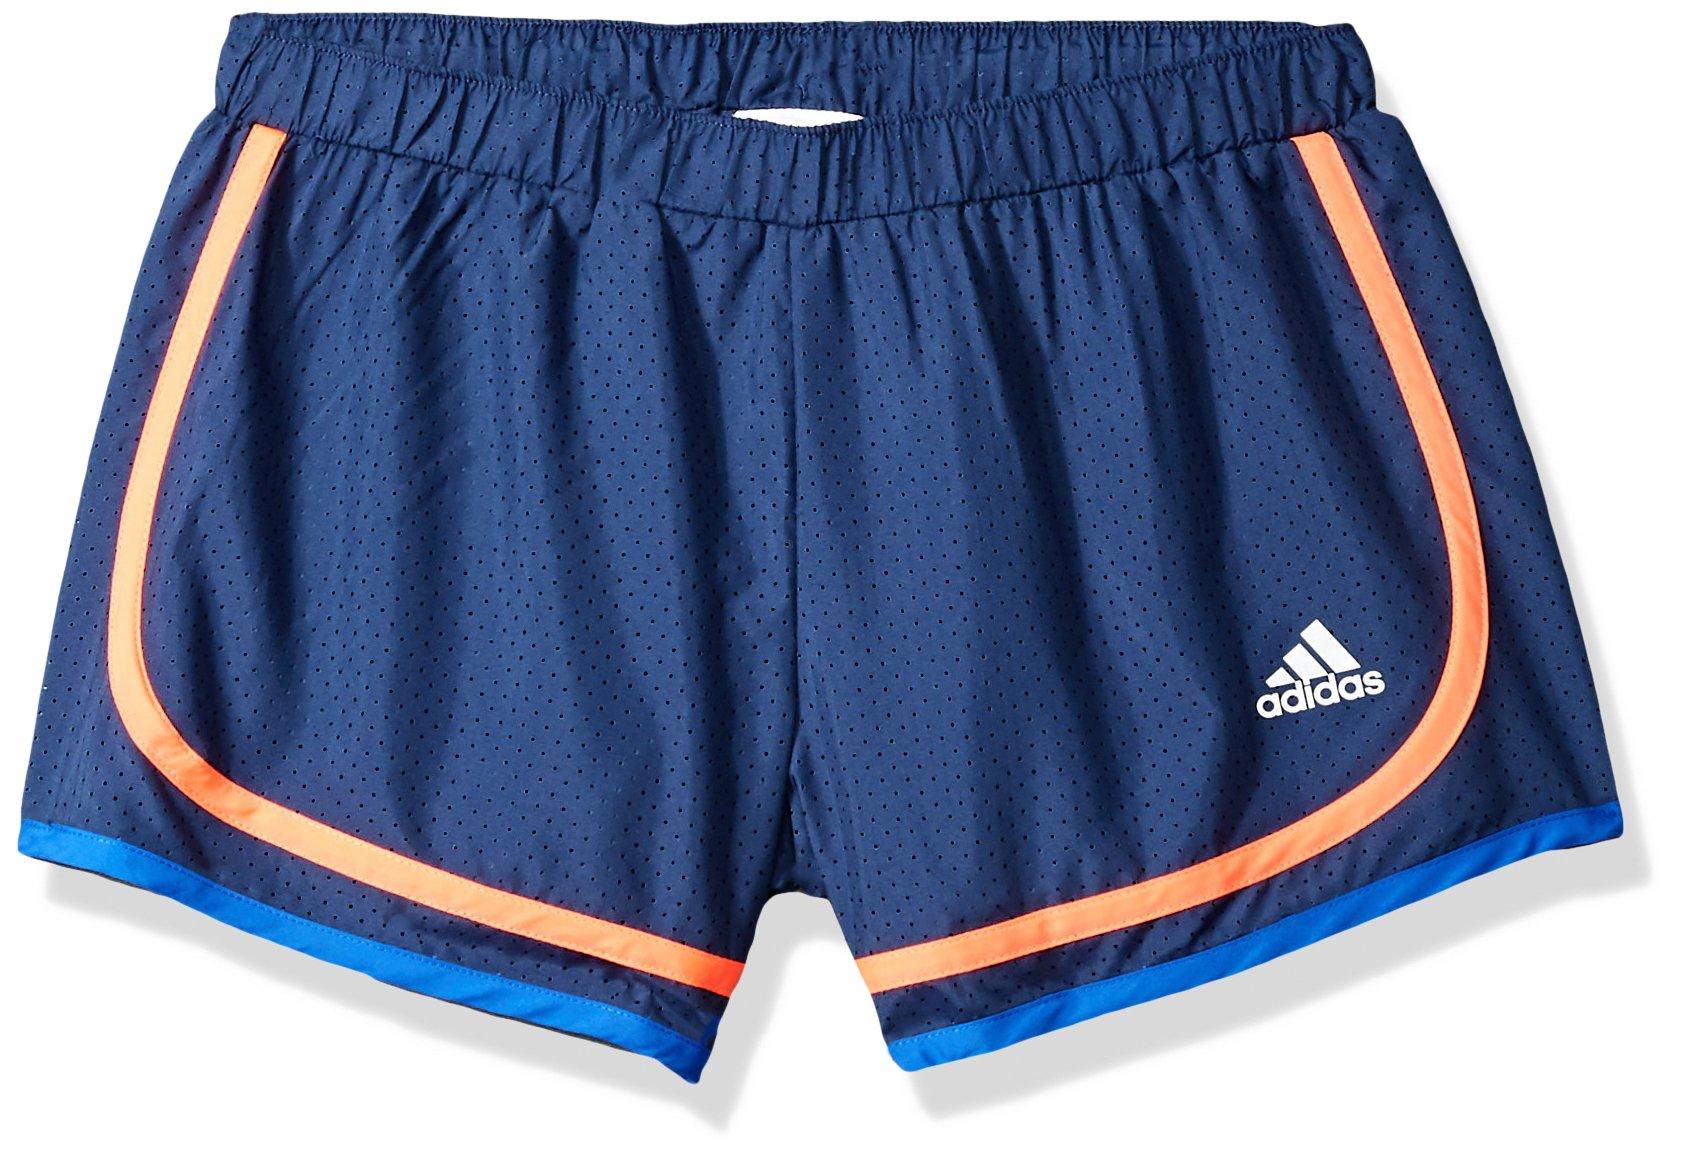 adidas Big Girls' Athletic Shorts, Noble Indigo Ad, Medium